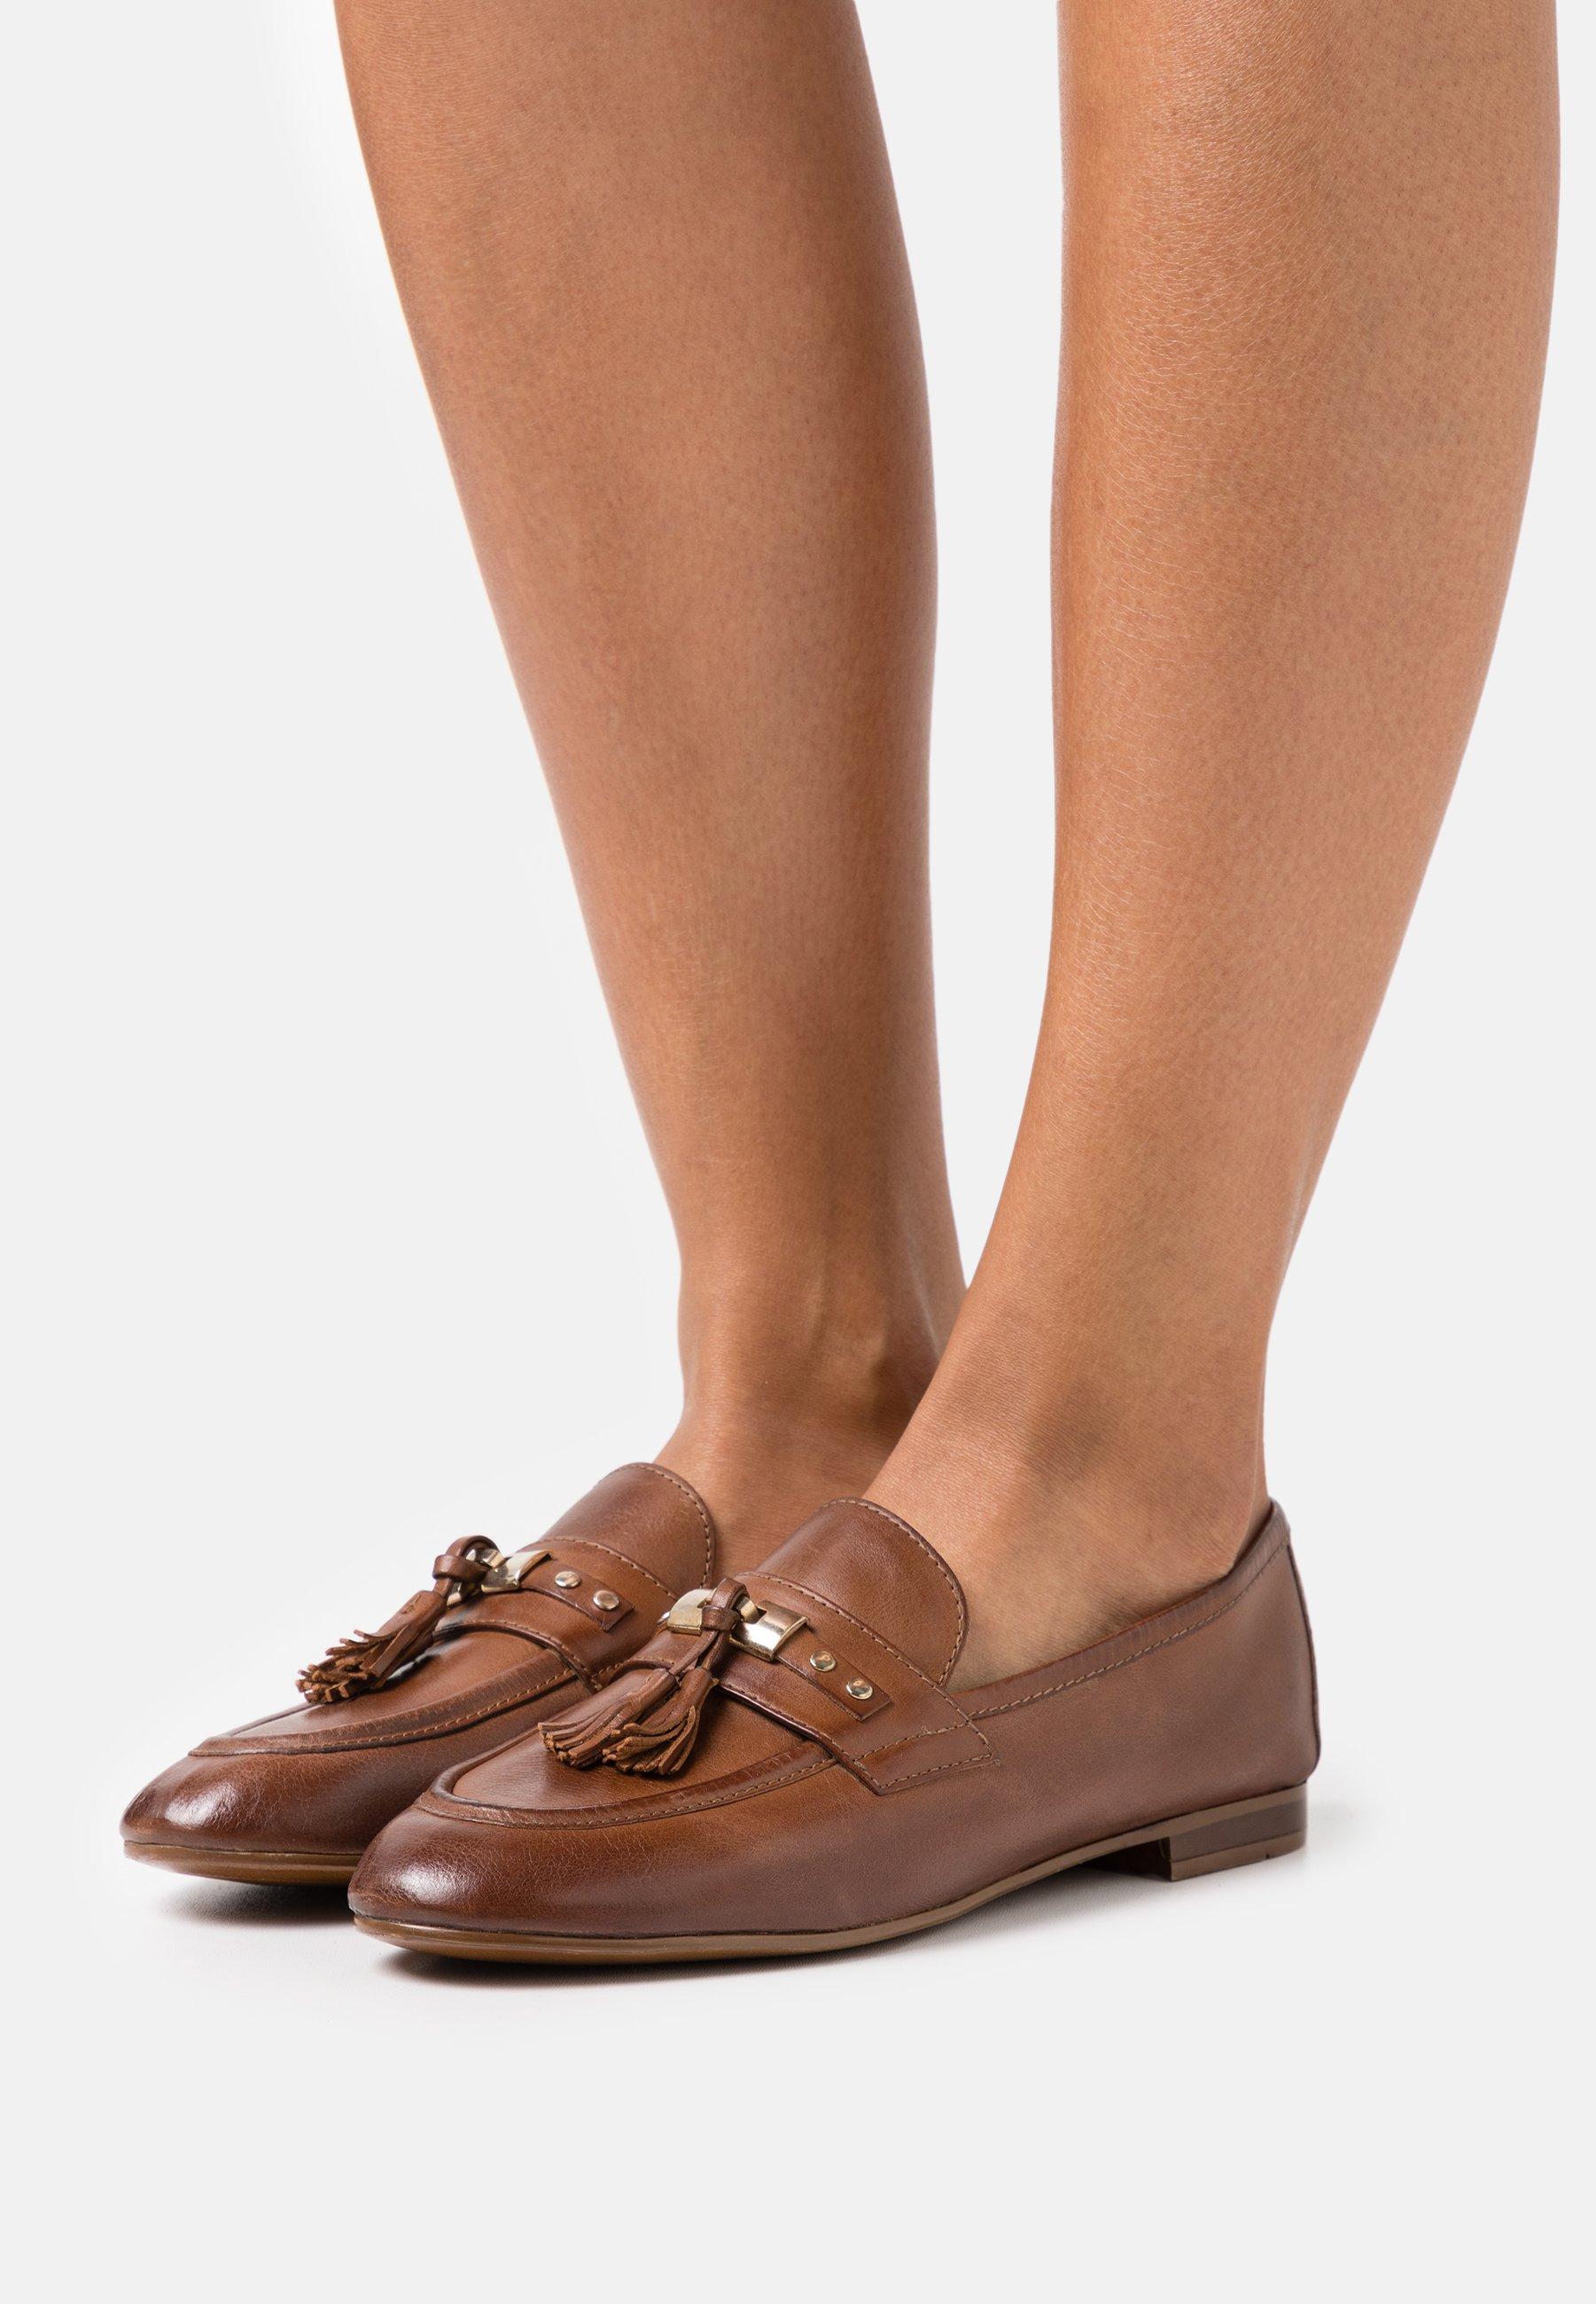 Women LEATHER - Slip-ons - brown